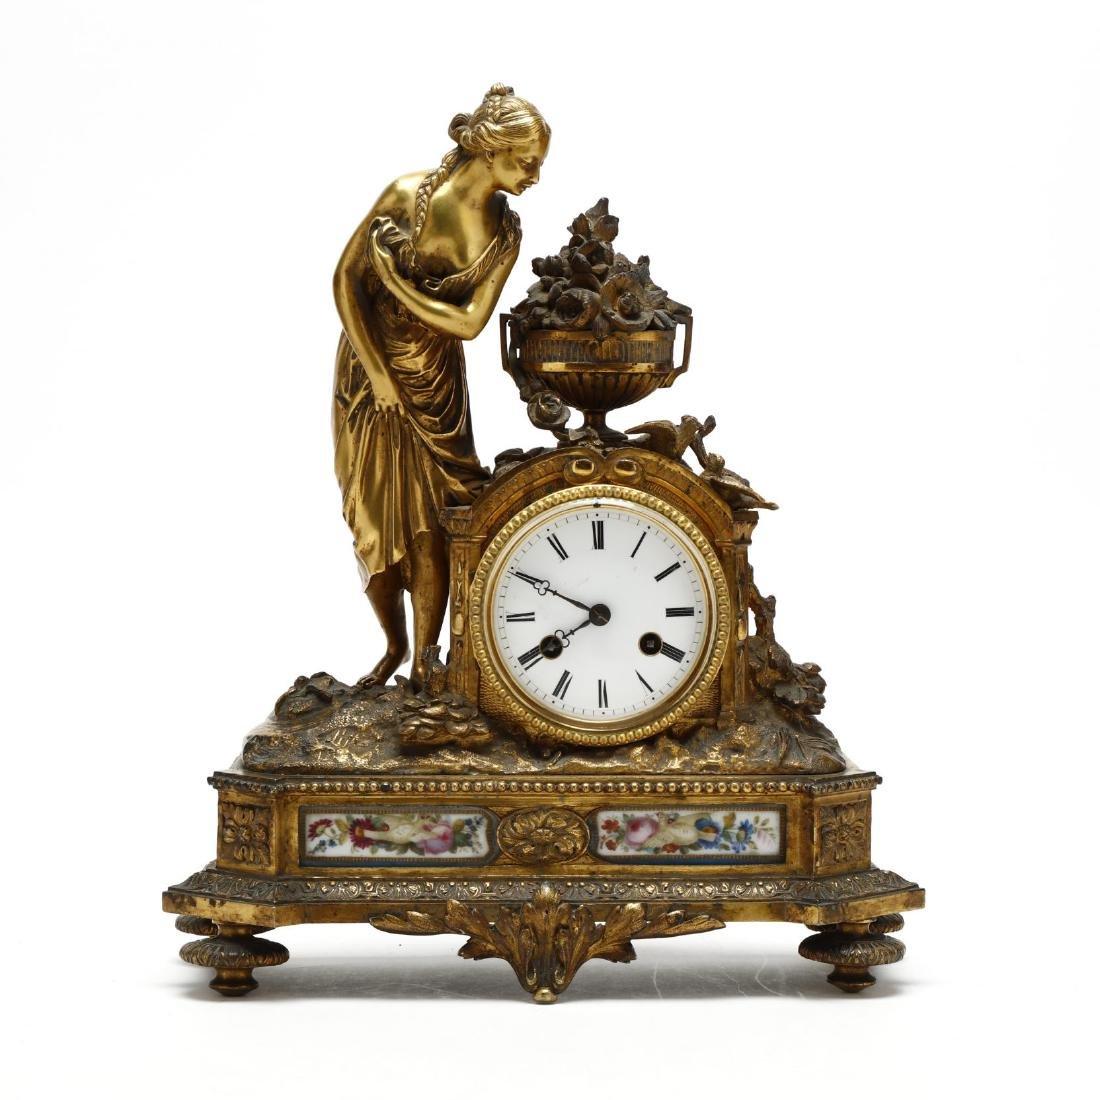 Antique French Gilt Bronze Figural Mantel Clock